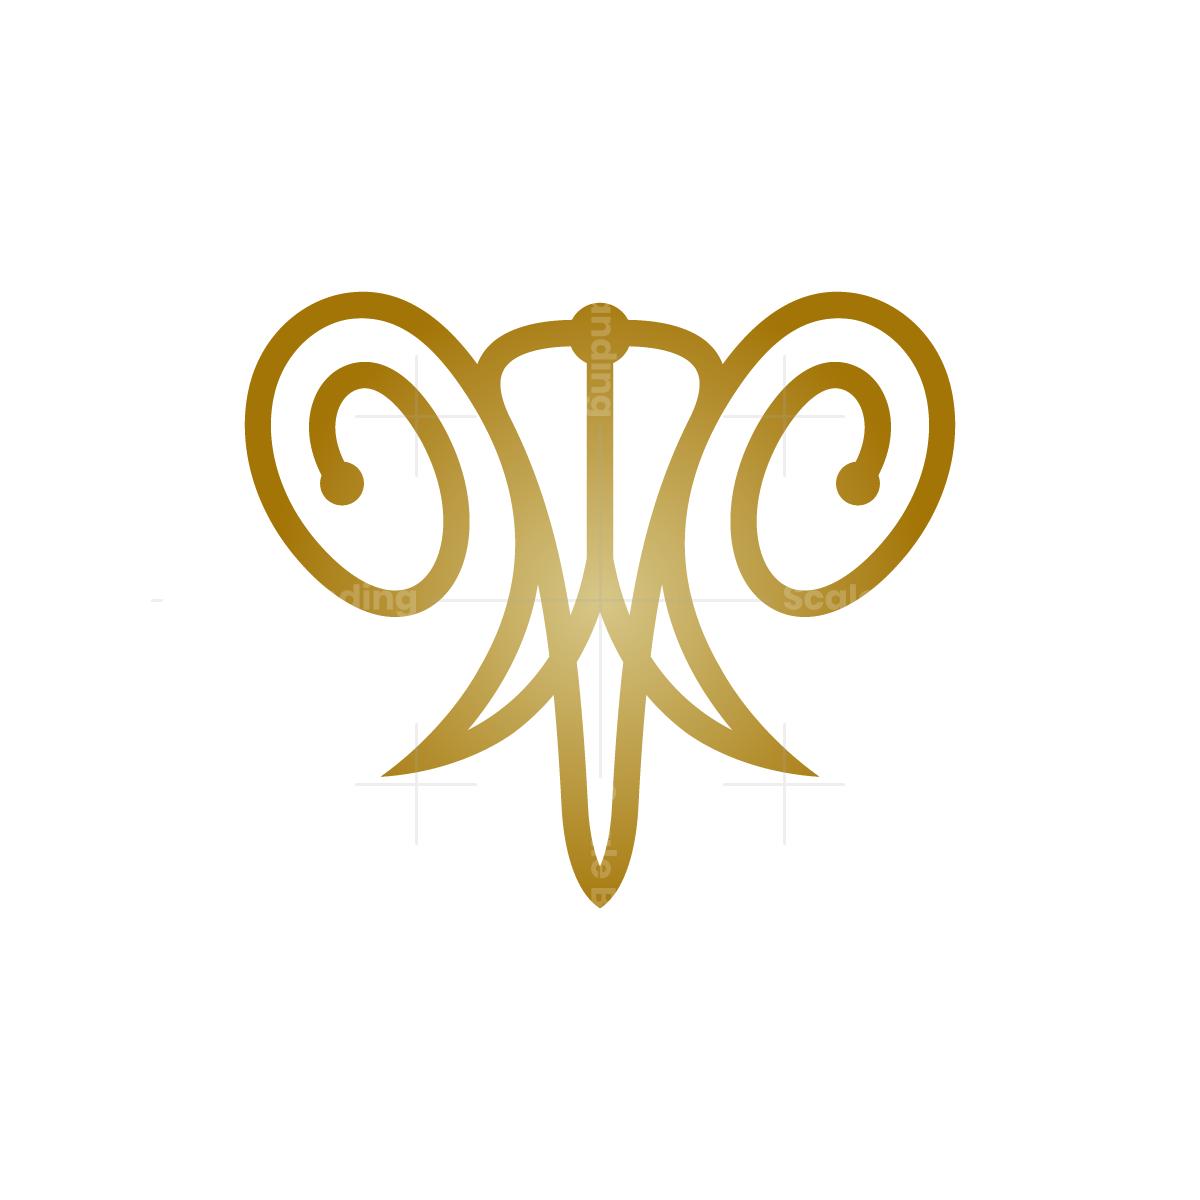 Golden Elephant Logo Pngtree provide golden elephant in.ai, eps and psd files format. golden elephant logo